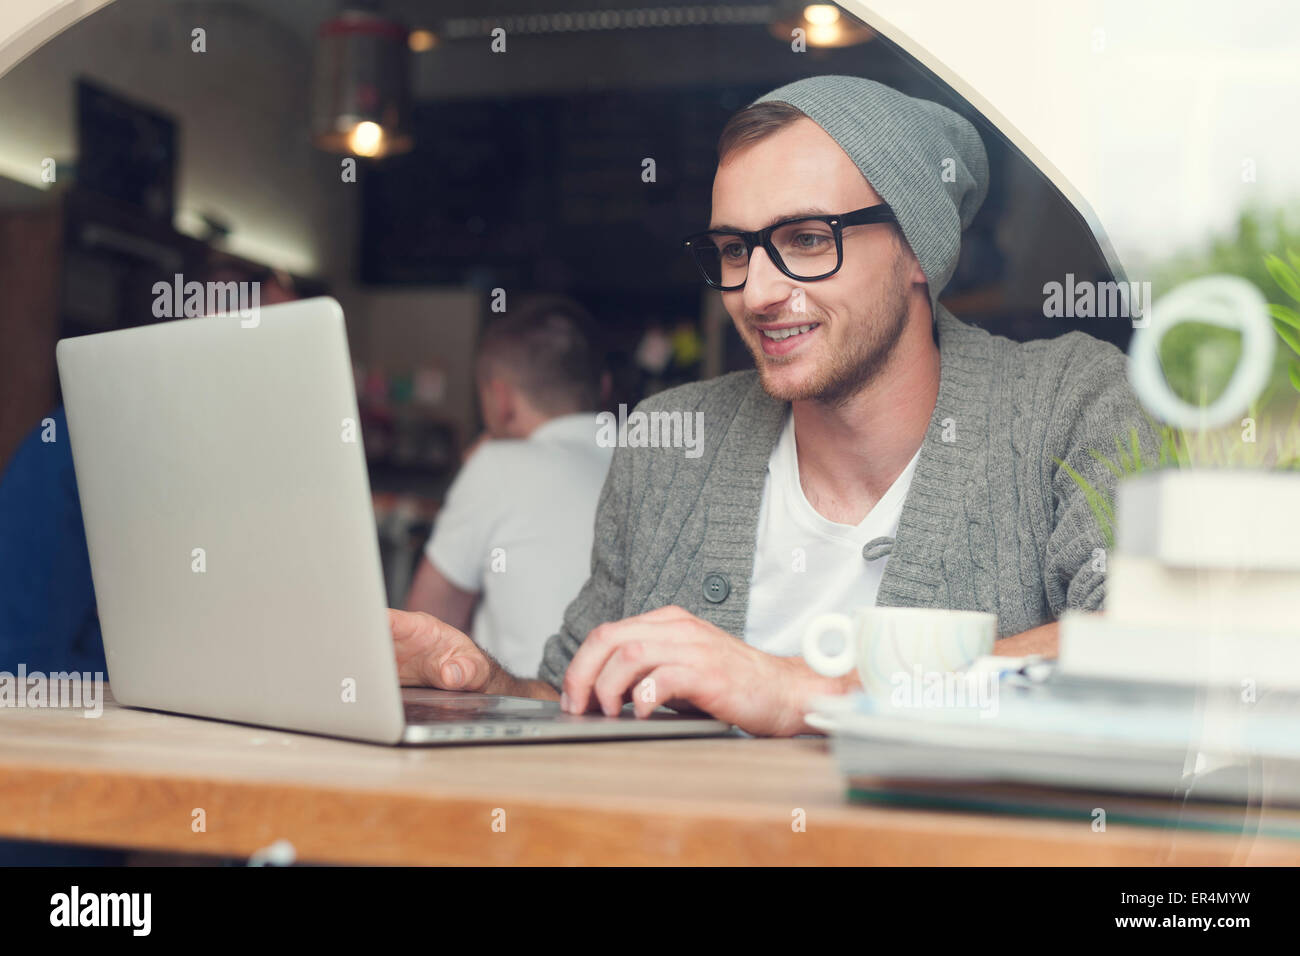 Guapo hipster utilización portátil en el cafe. Cracovia, Polonia Imagen De Stock